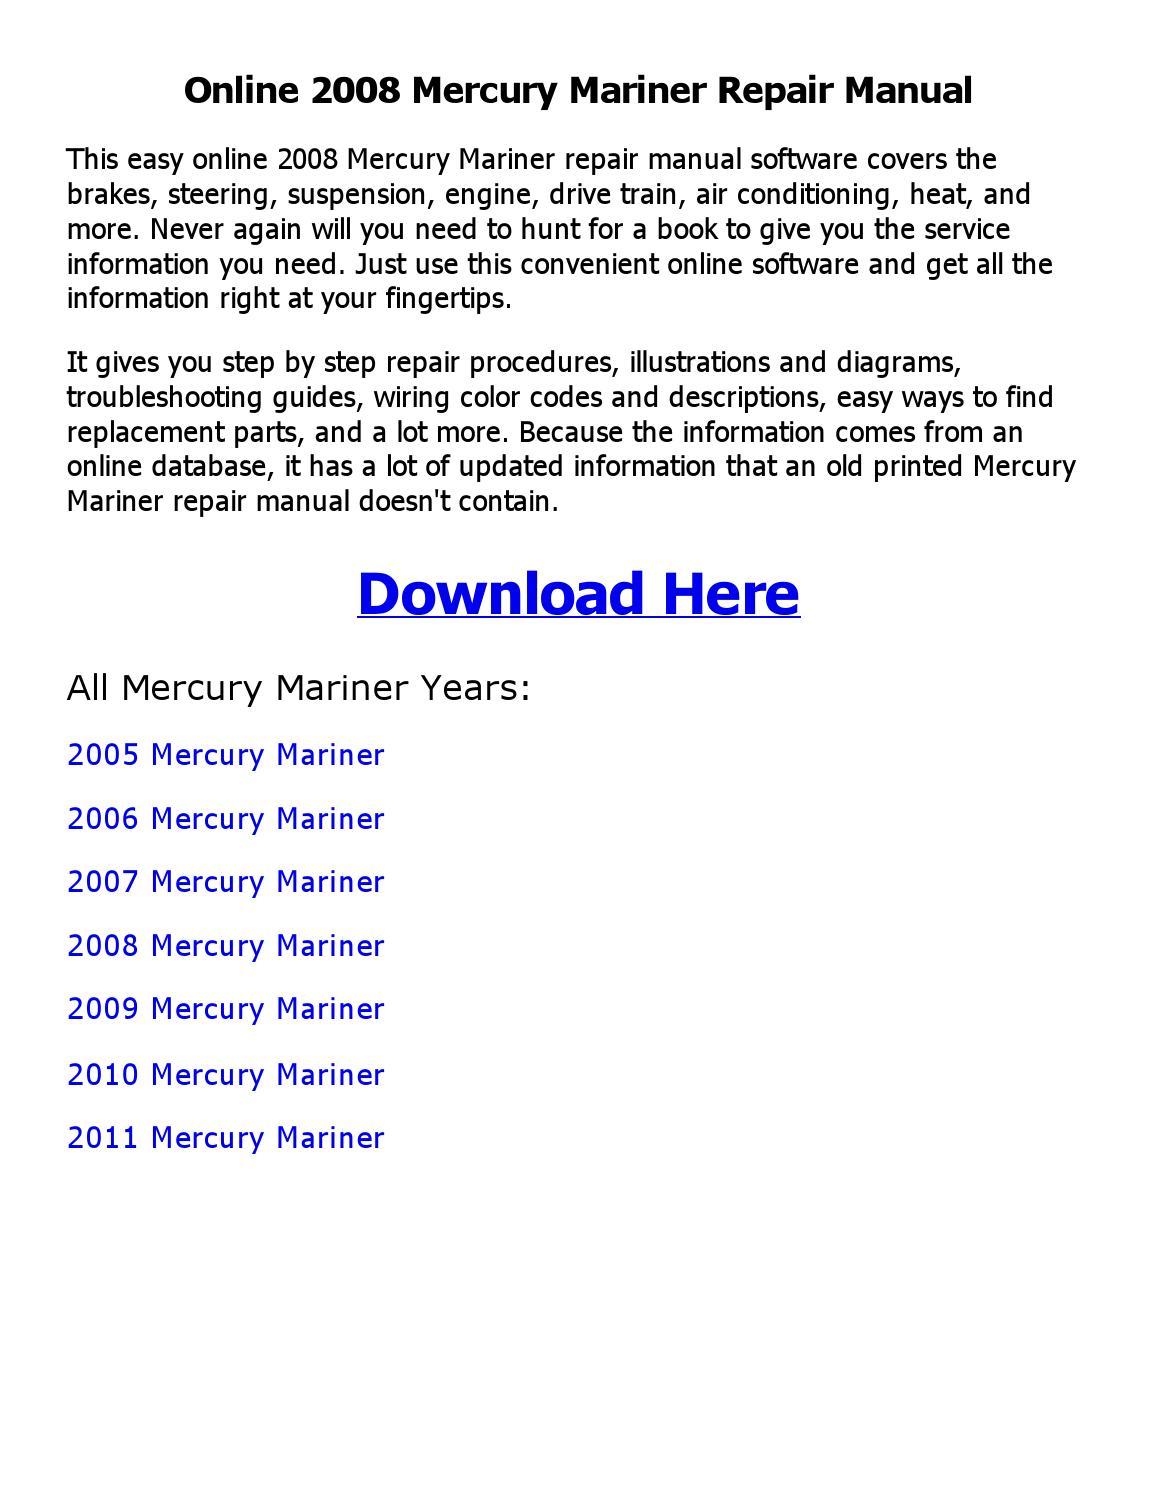 2011 Mercury Mariner Wiring Diagram Library 2005 2008 Repair Manual Online By Imran Ali Issuu